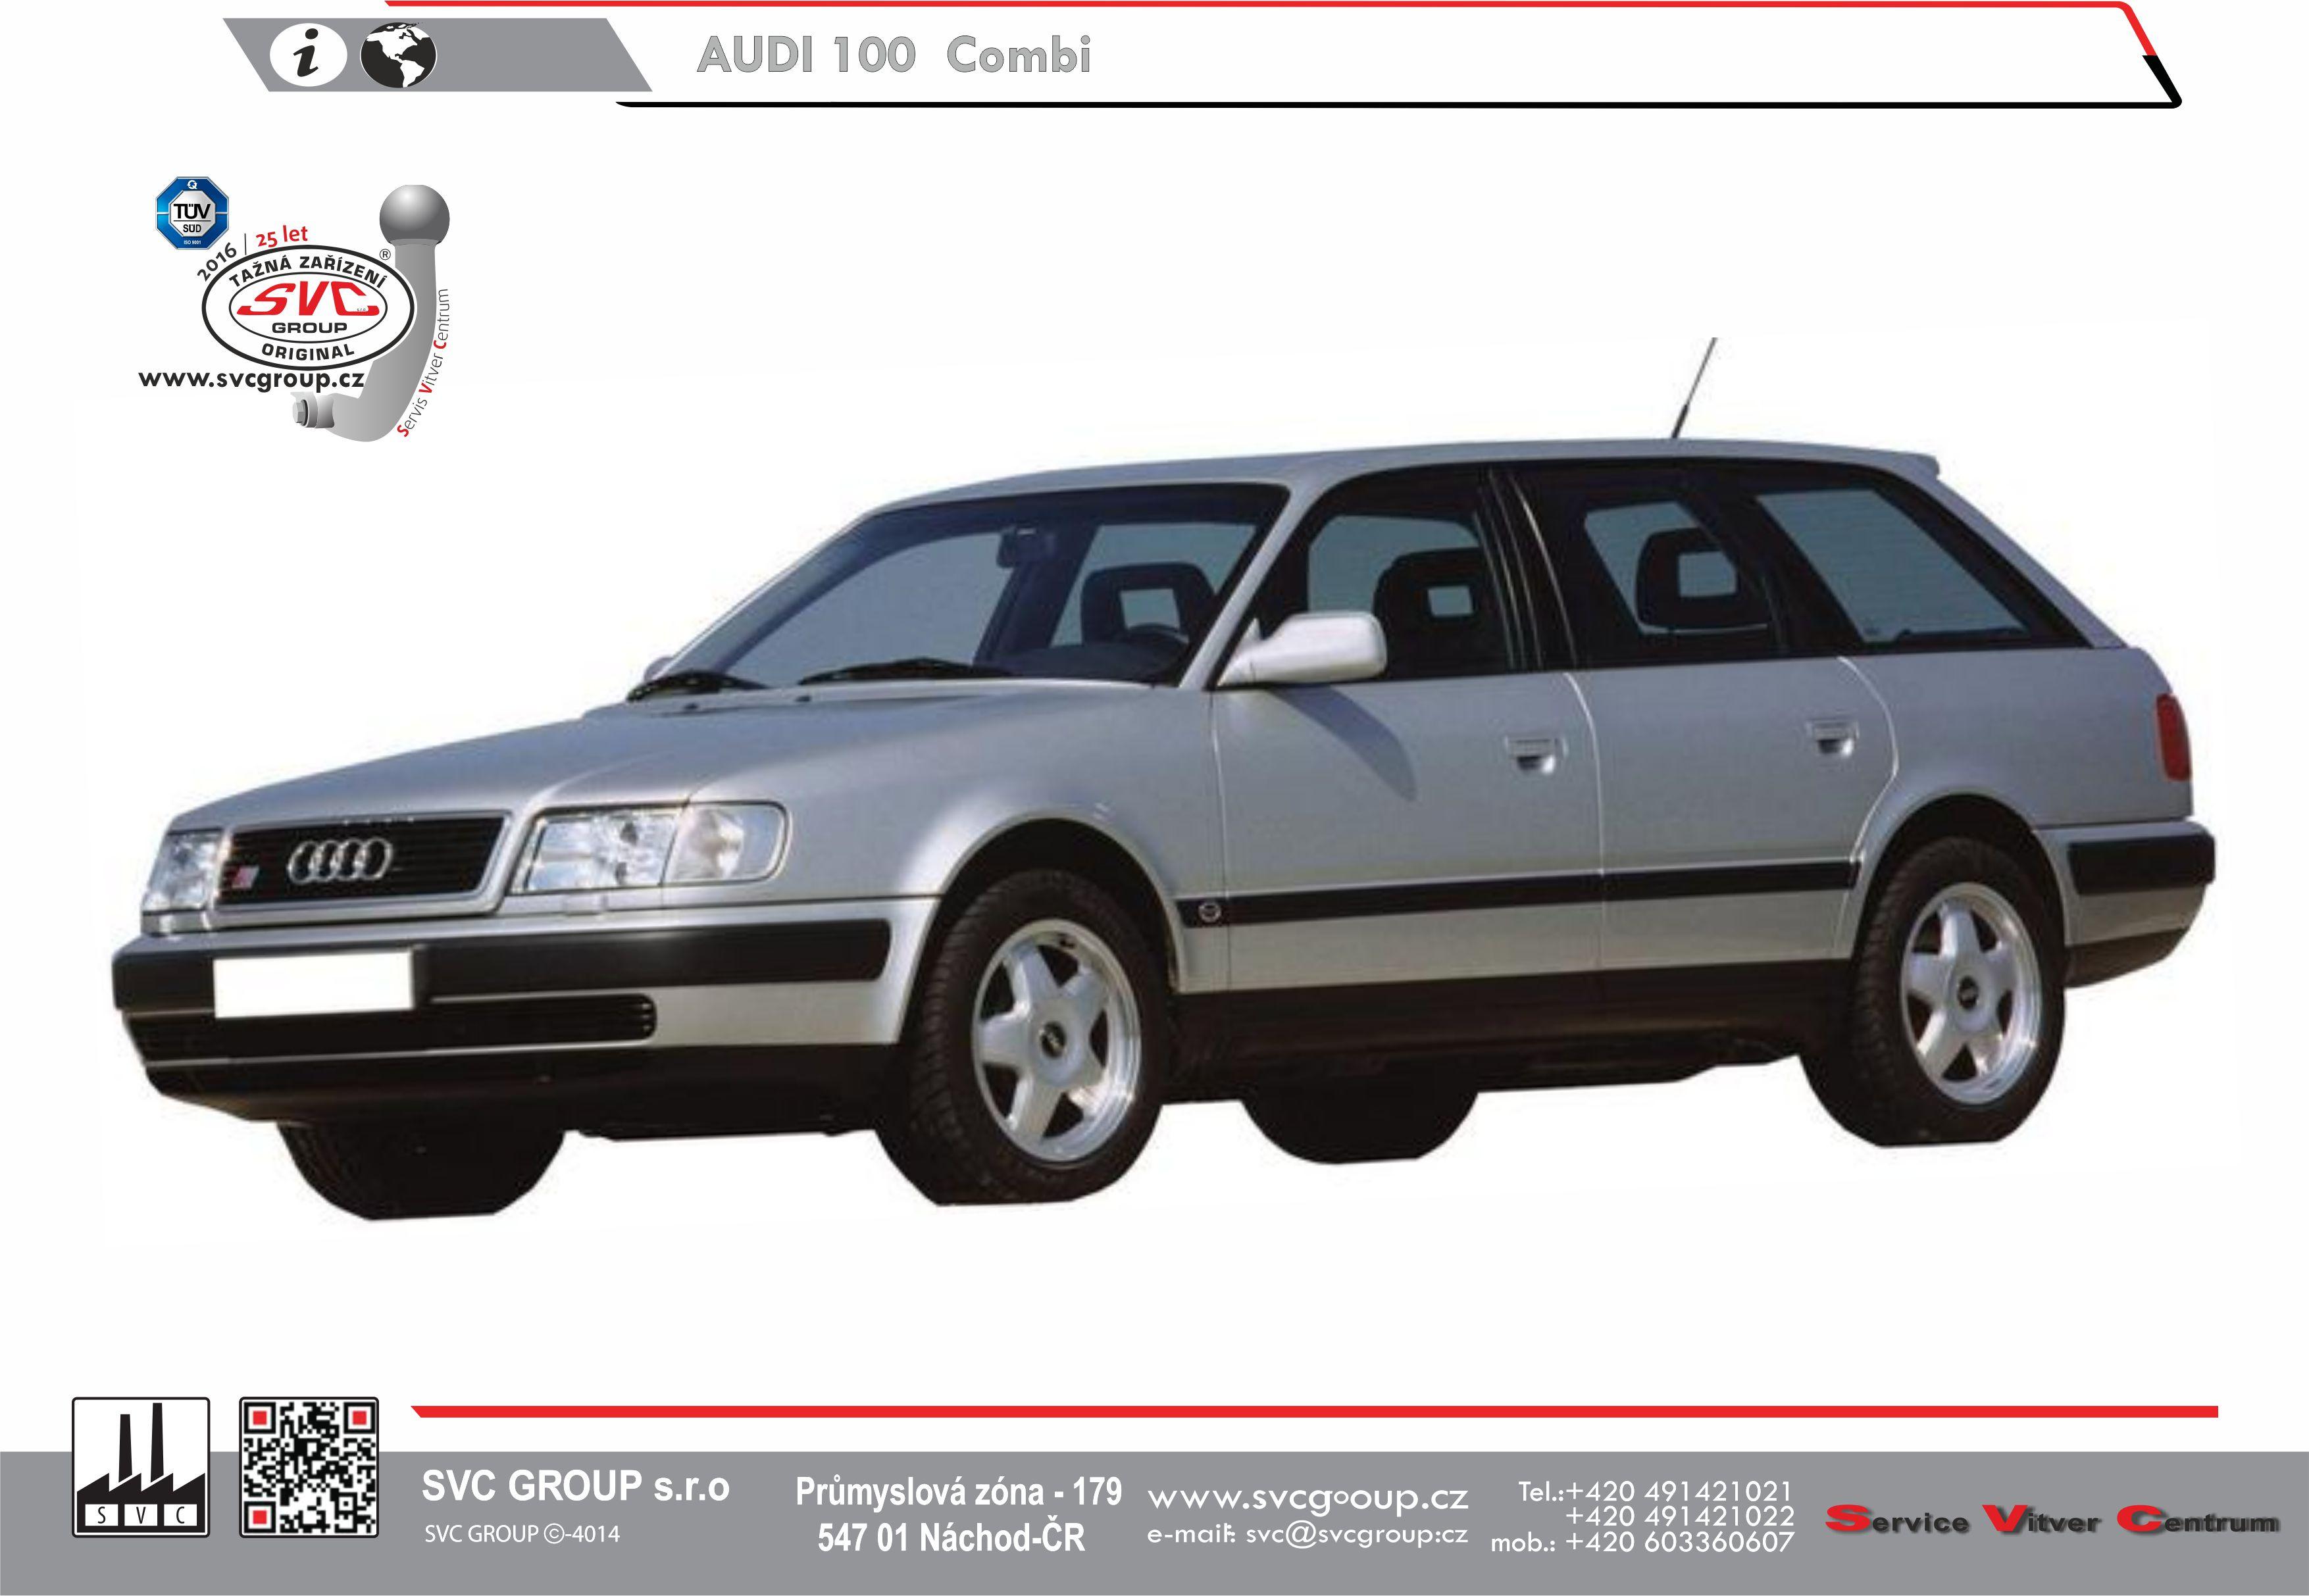 Audi 100 Kombi